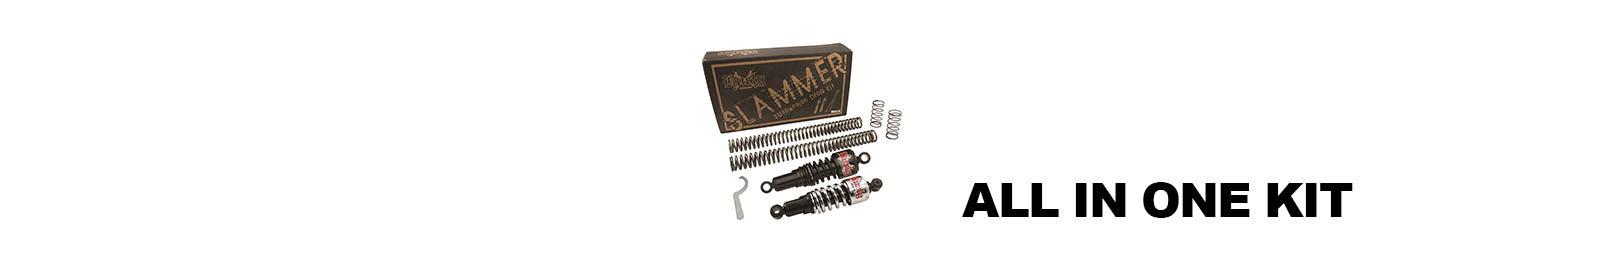 Burly Slammer Kits